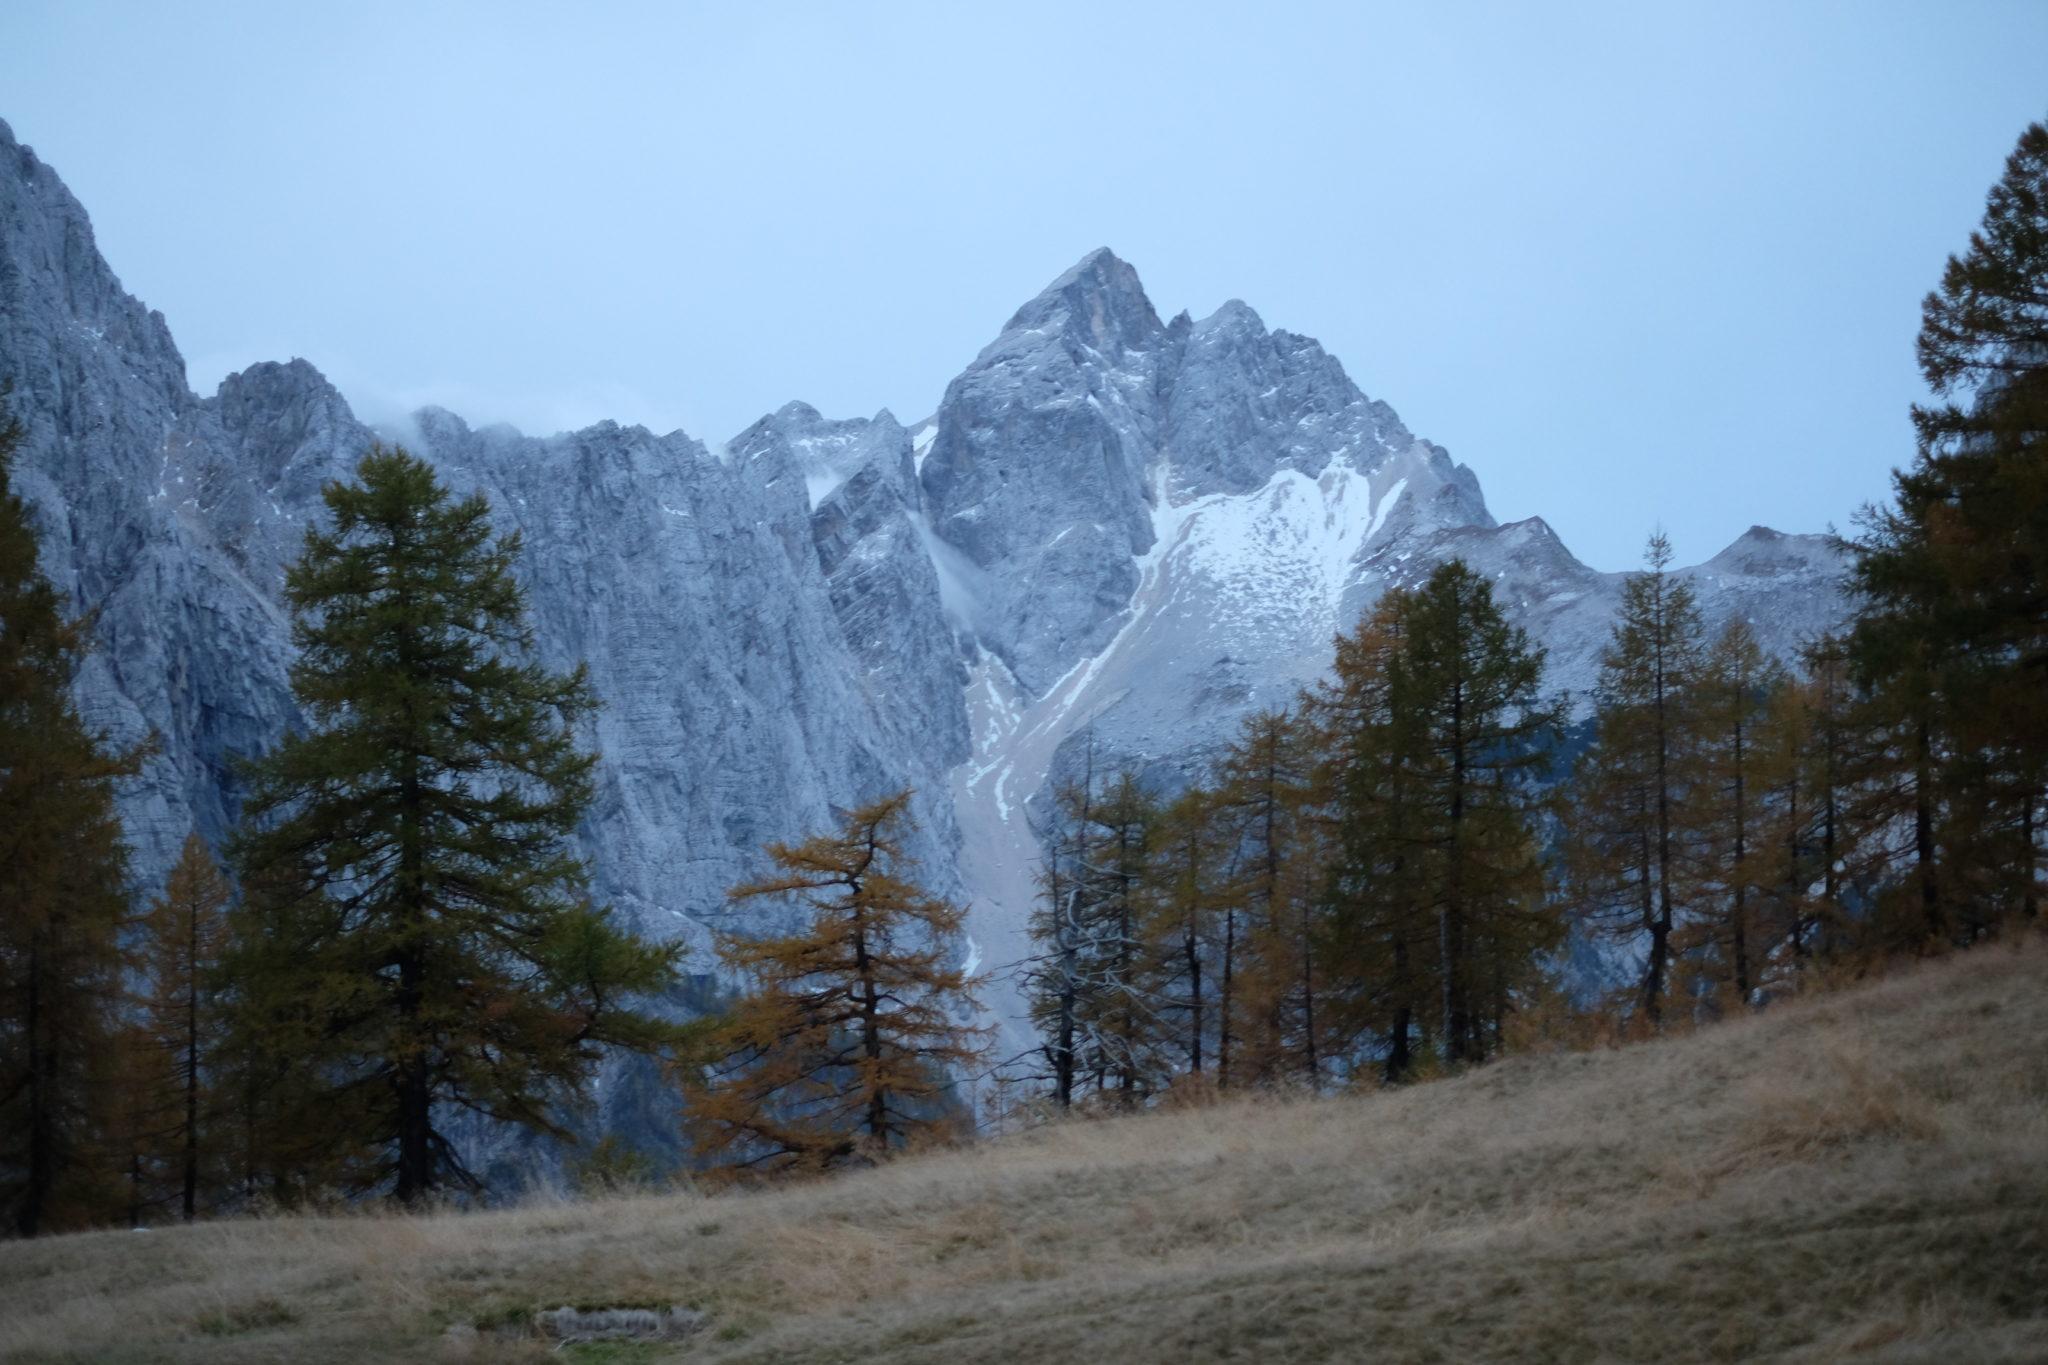 Mt. Jalovec, 2,645 m, from Sleme, Julian Alps, Slovenia, Kranjska Gora, Vršič